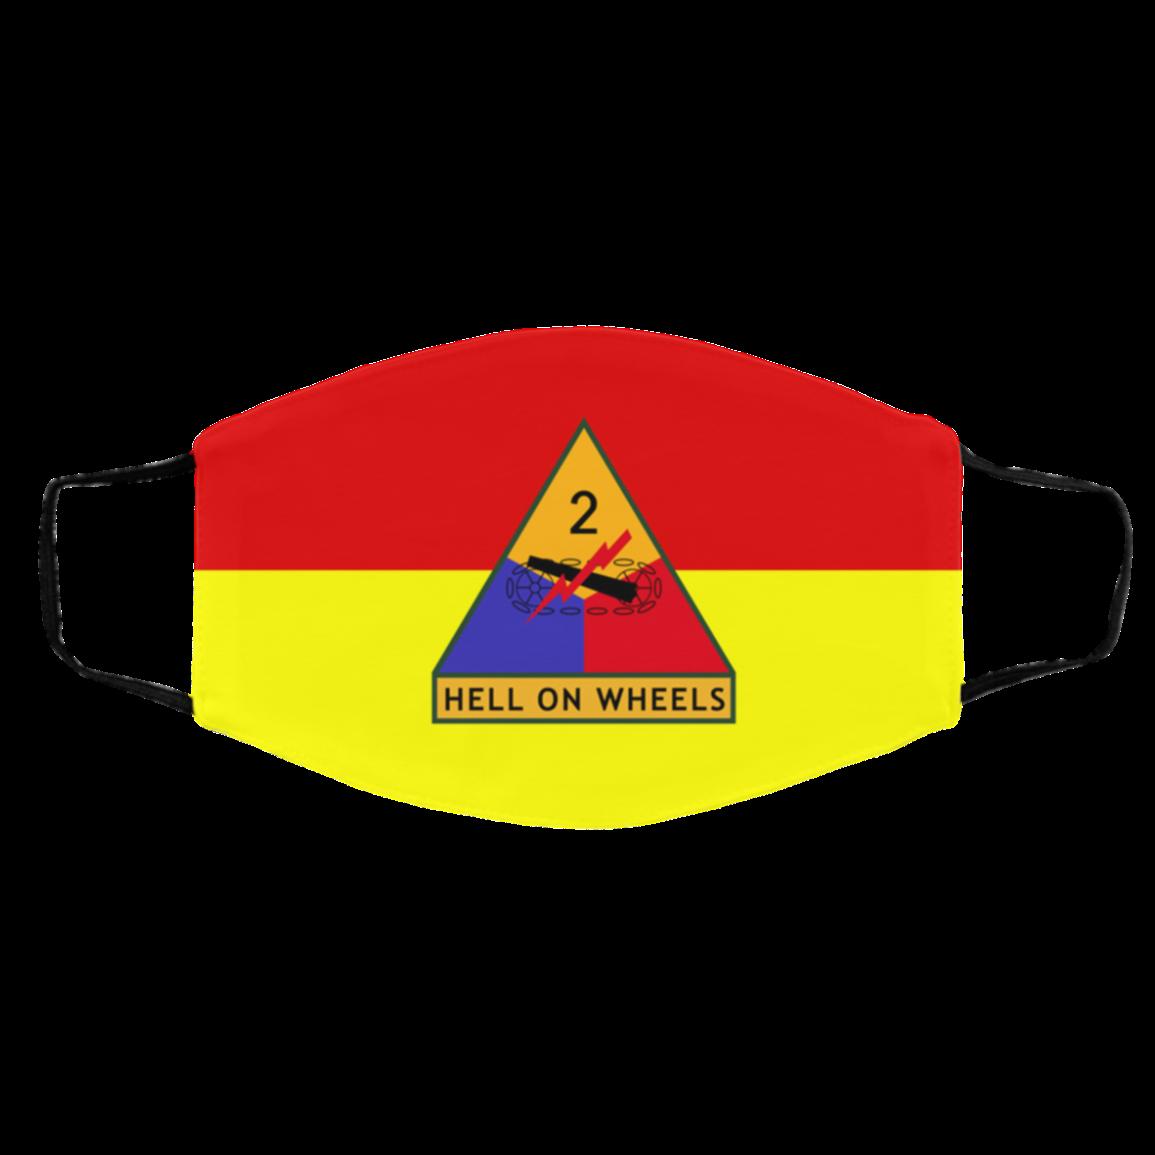 Ar-my Vet-eran 2nd Armor-ed Division Cloth Face Masks